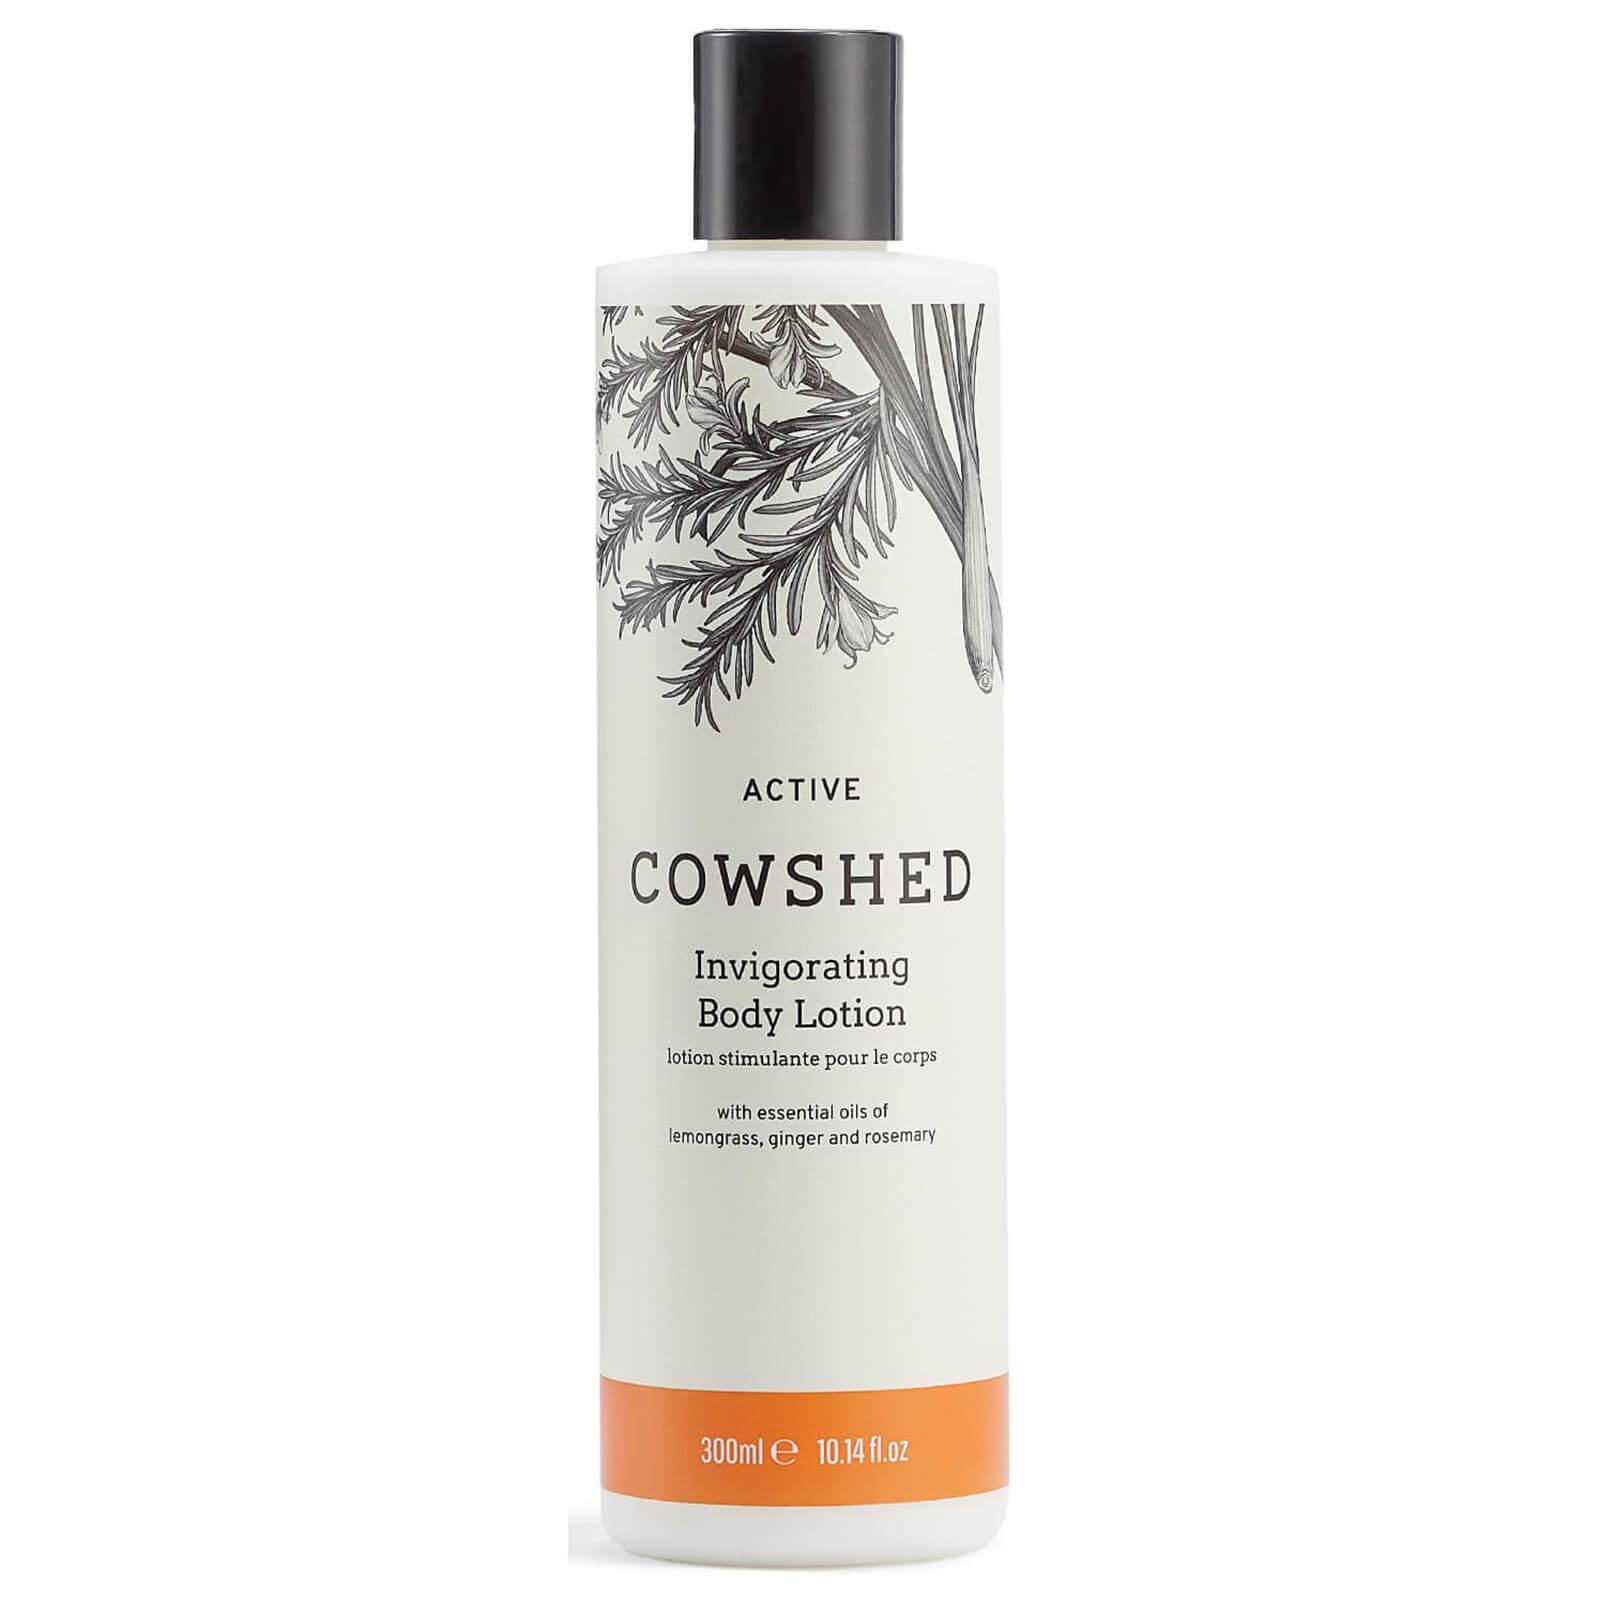 Купить Cowshed ACTIVE Invigorating Body Lotion 300ml